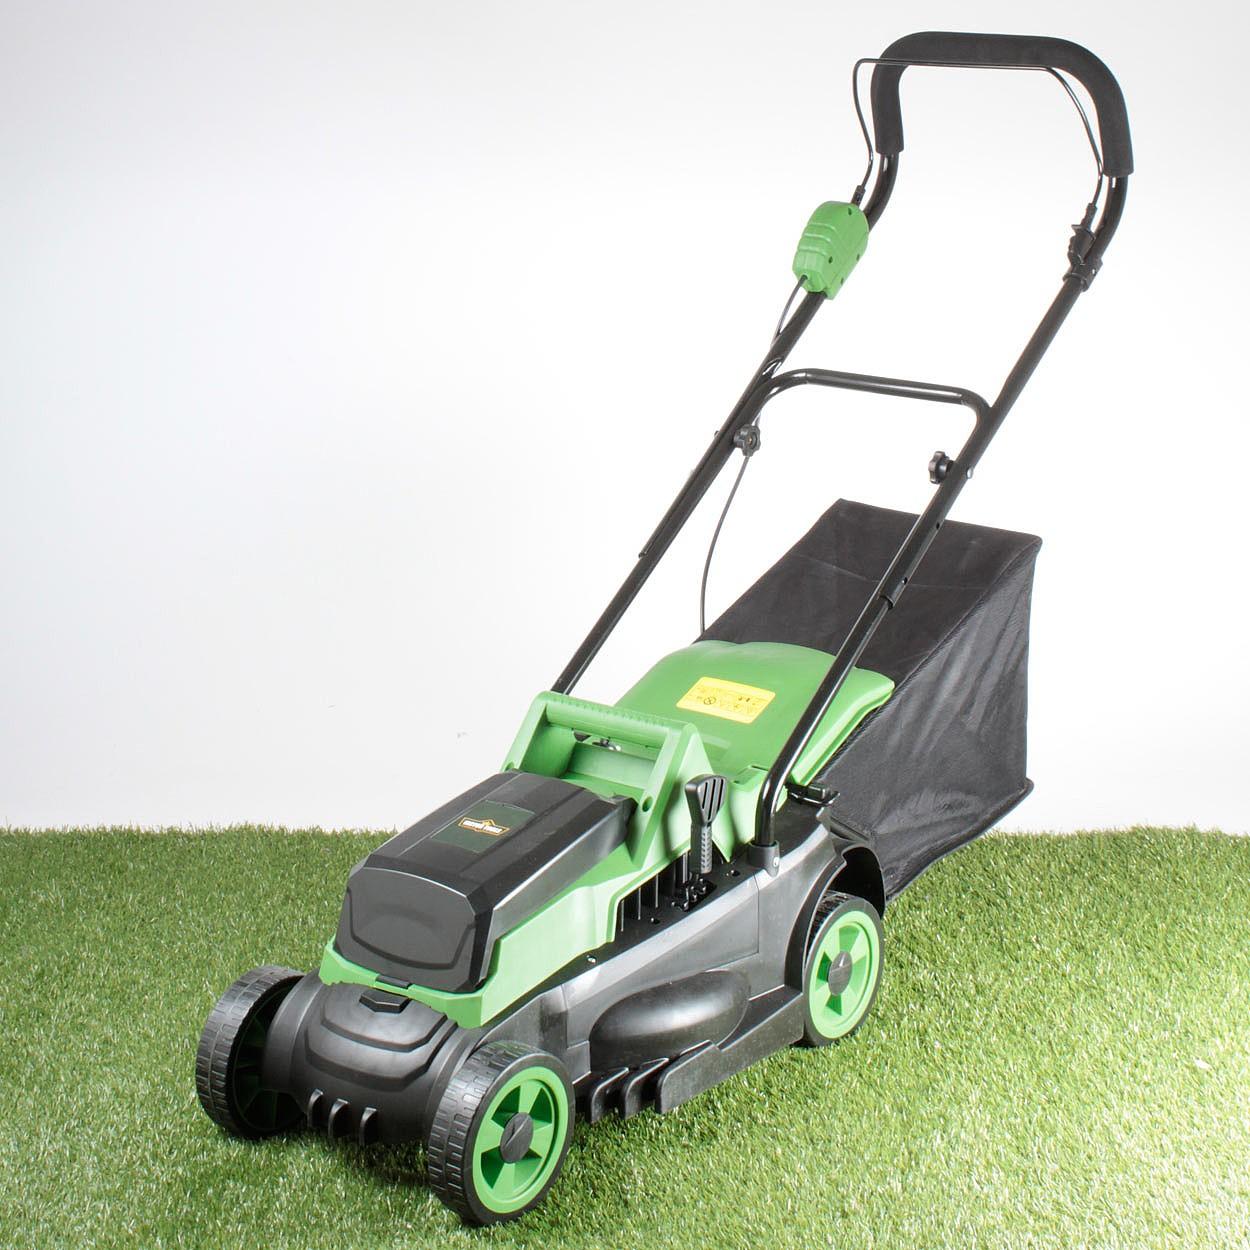 40V Lawnmower Cordless